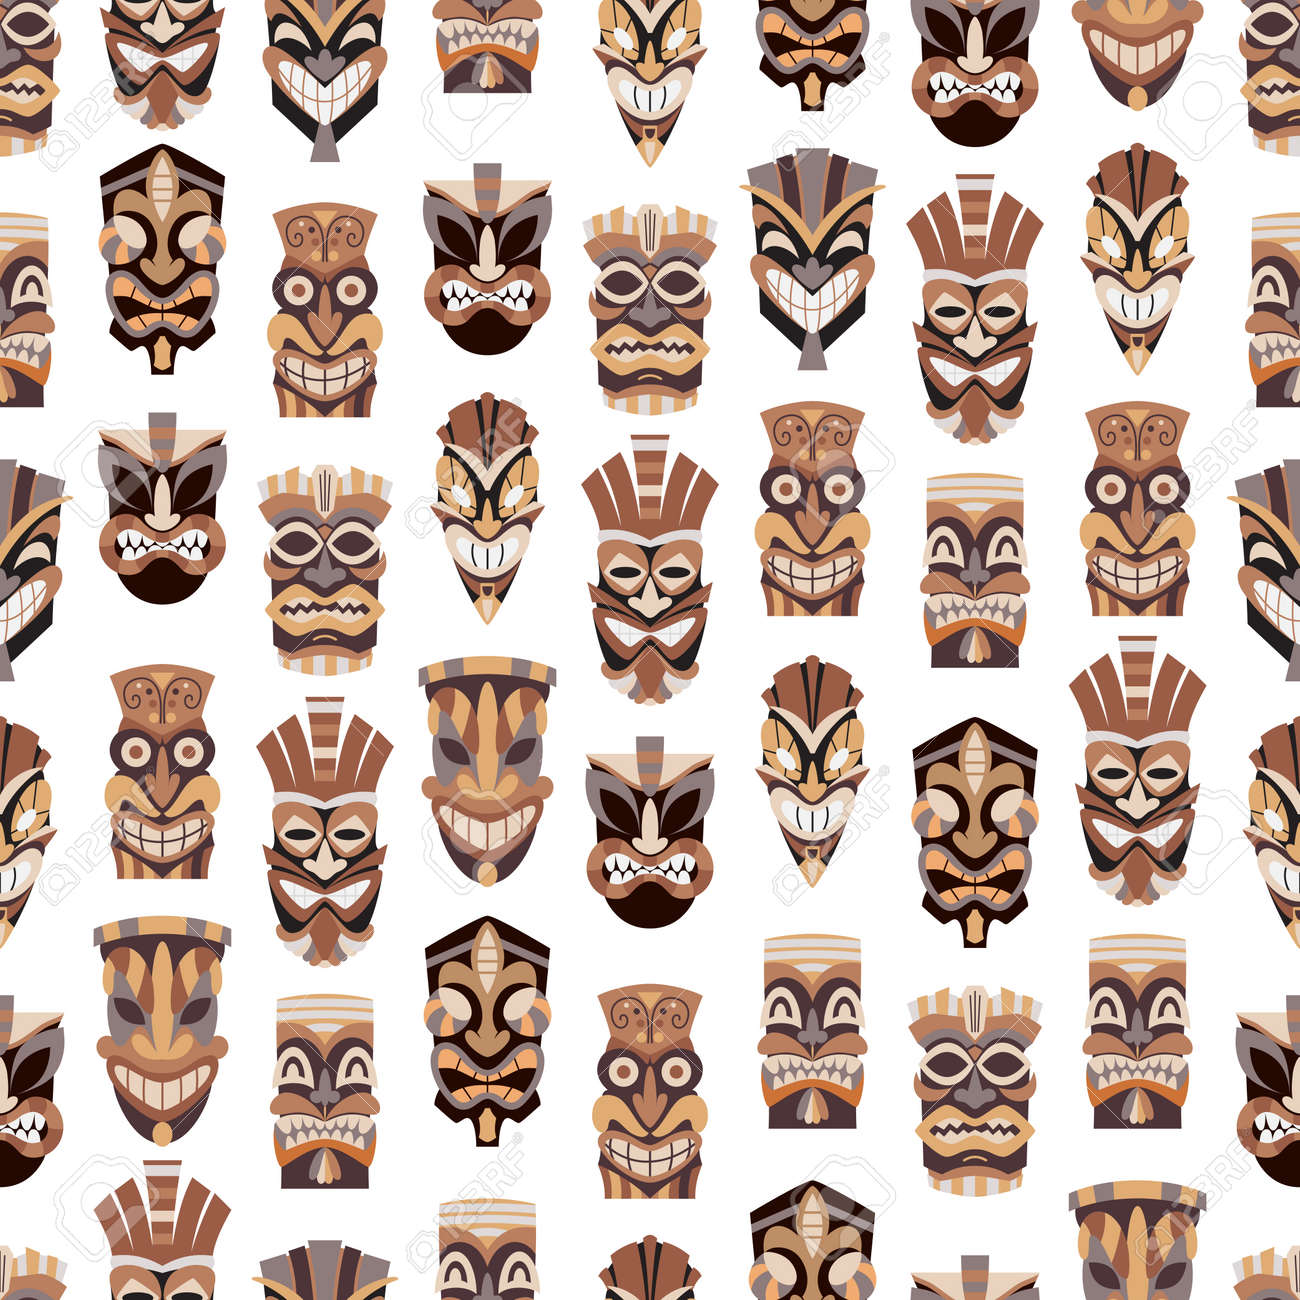 Tiki Wallpapers - Wallpaper Cave